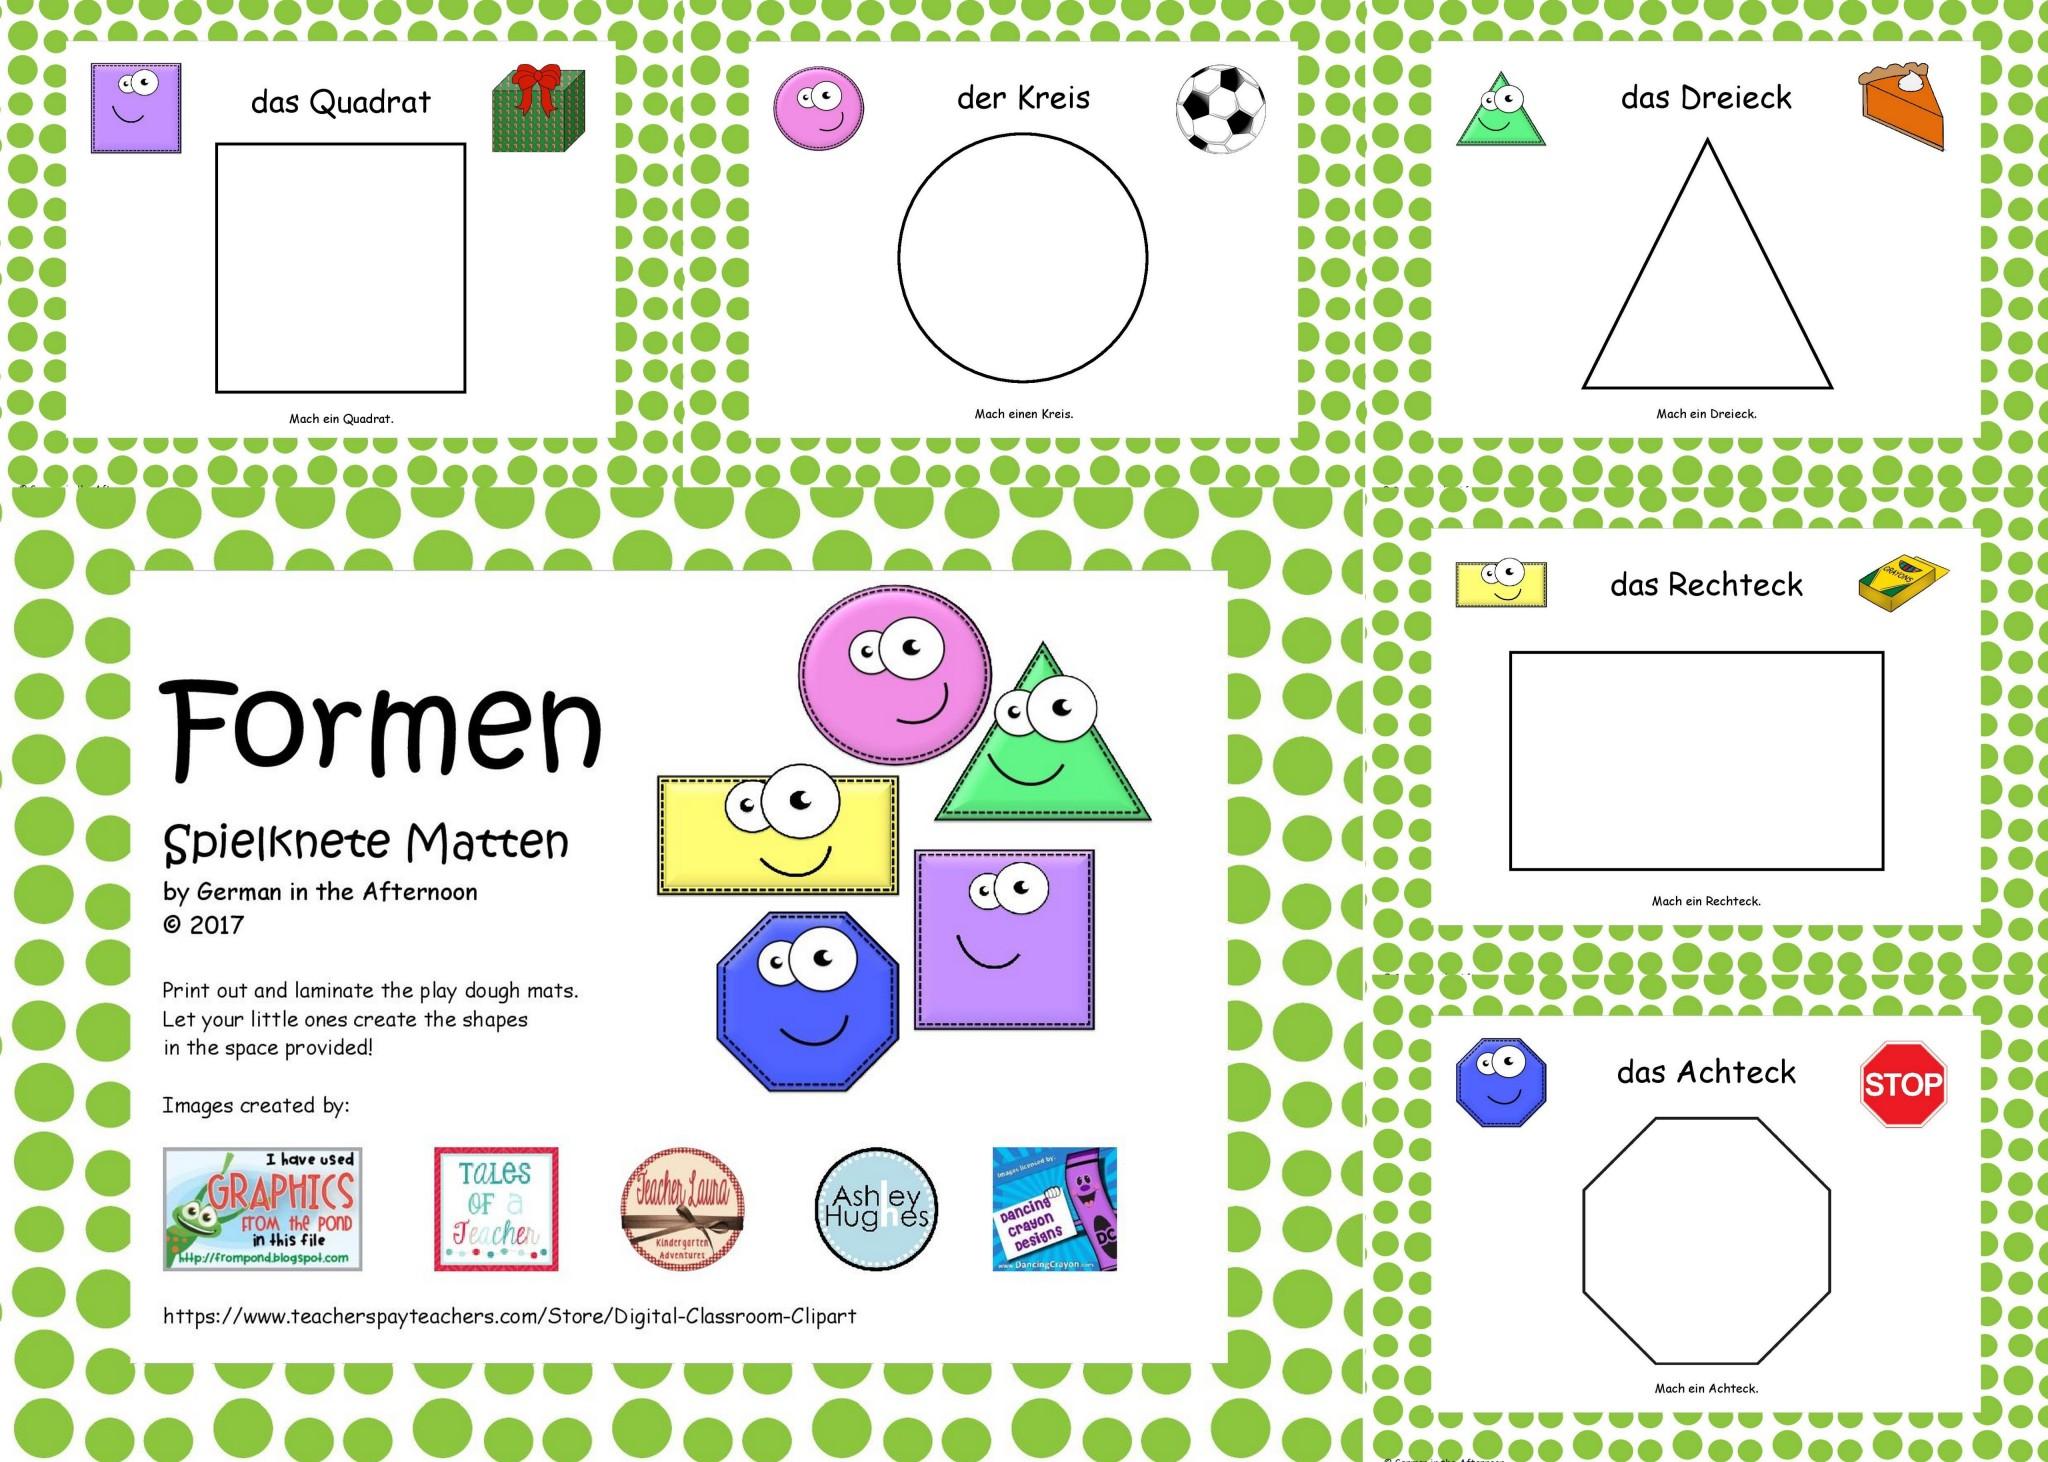 formen-play-doh-matten-collage-gita1